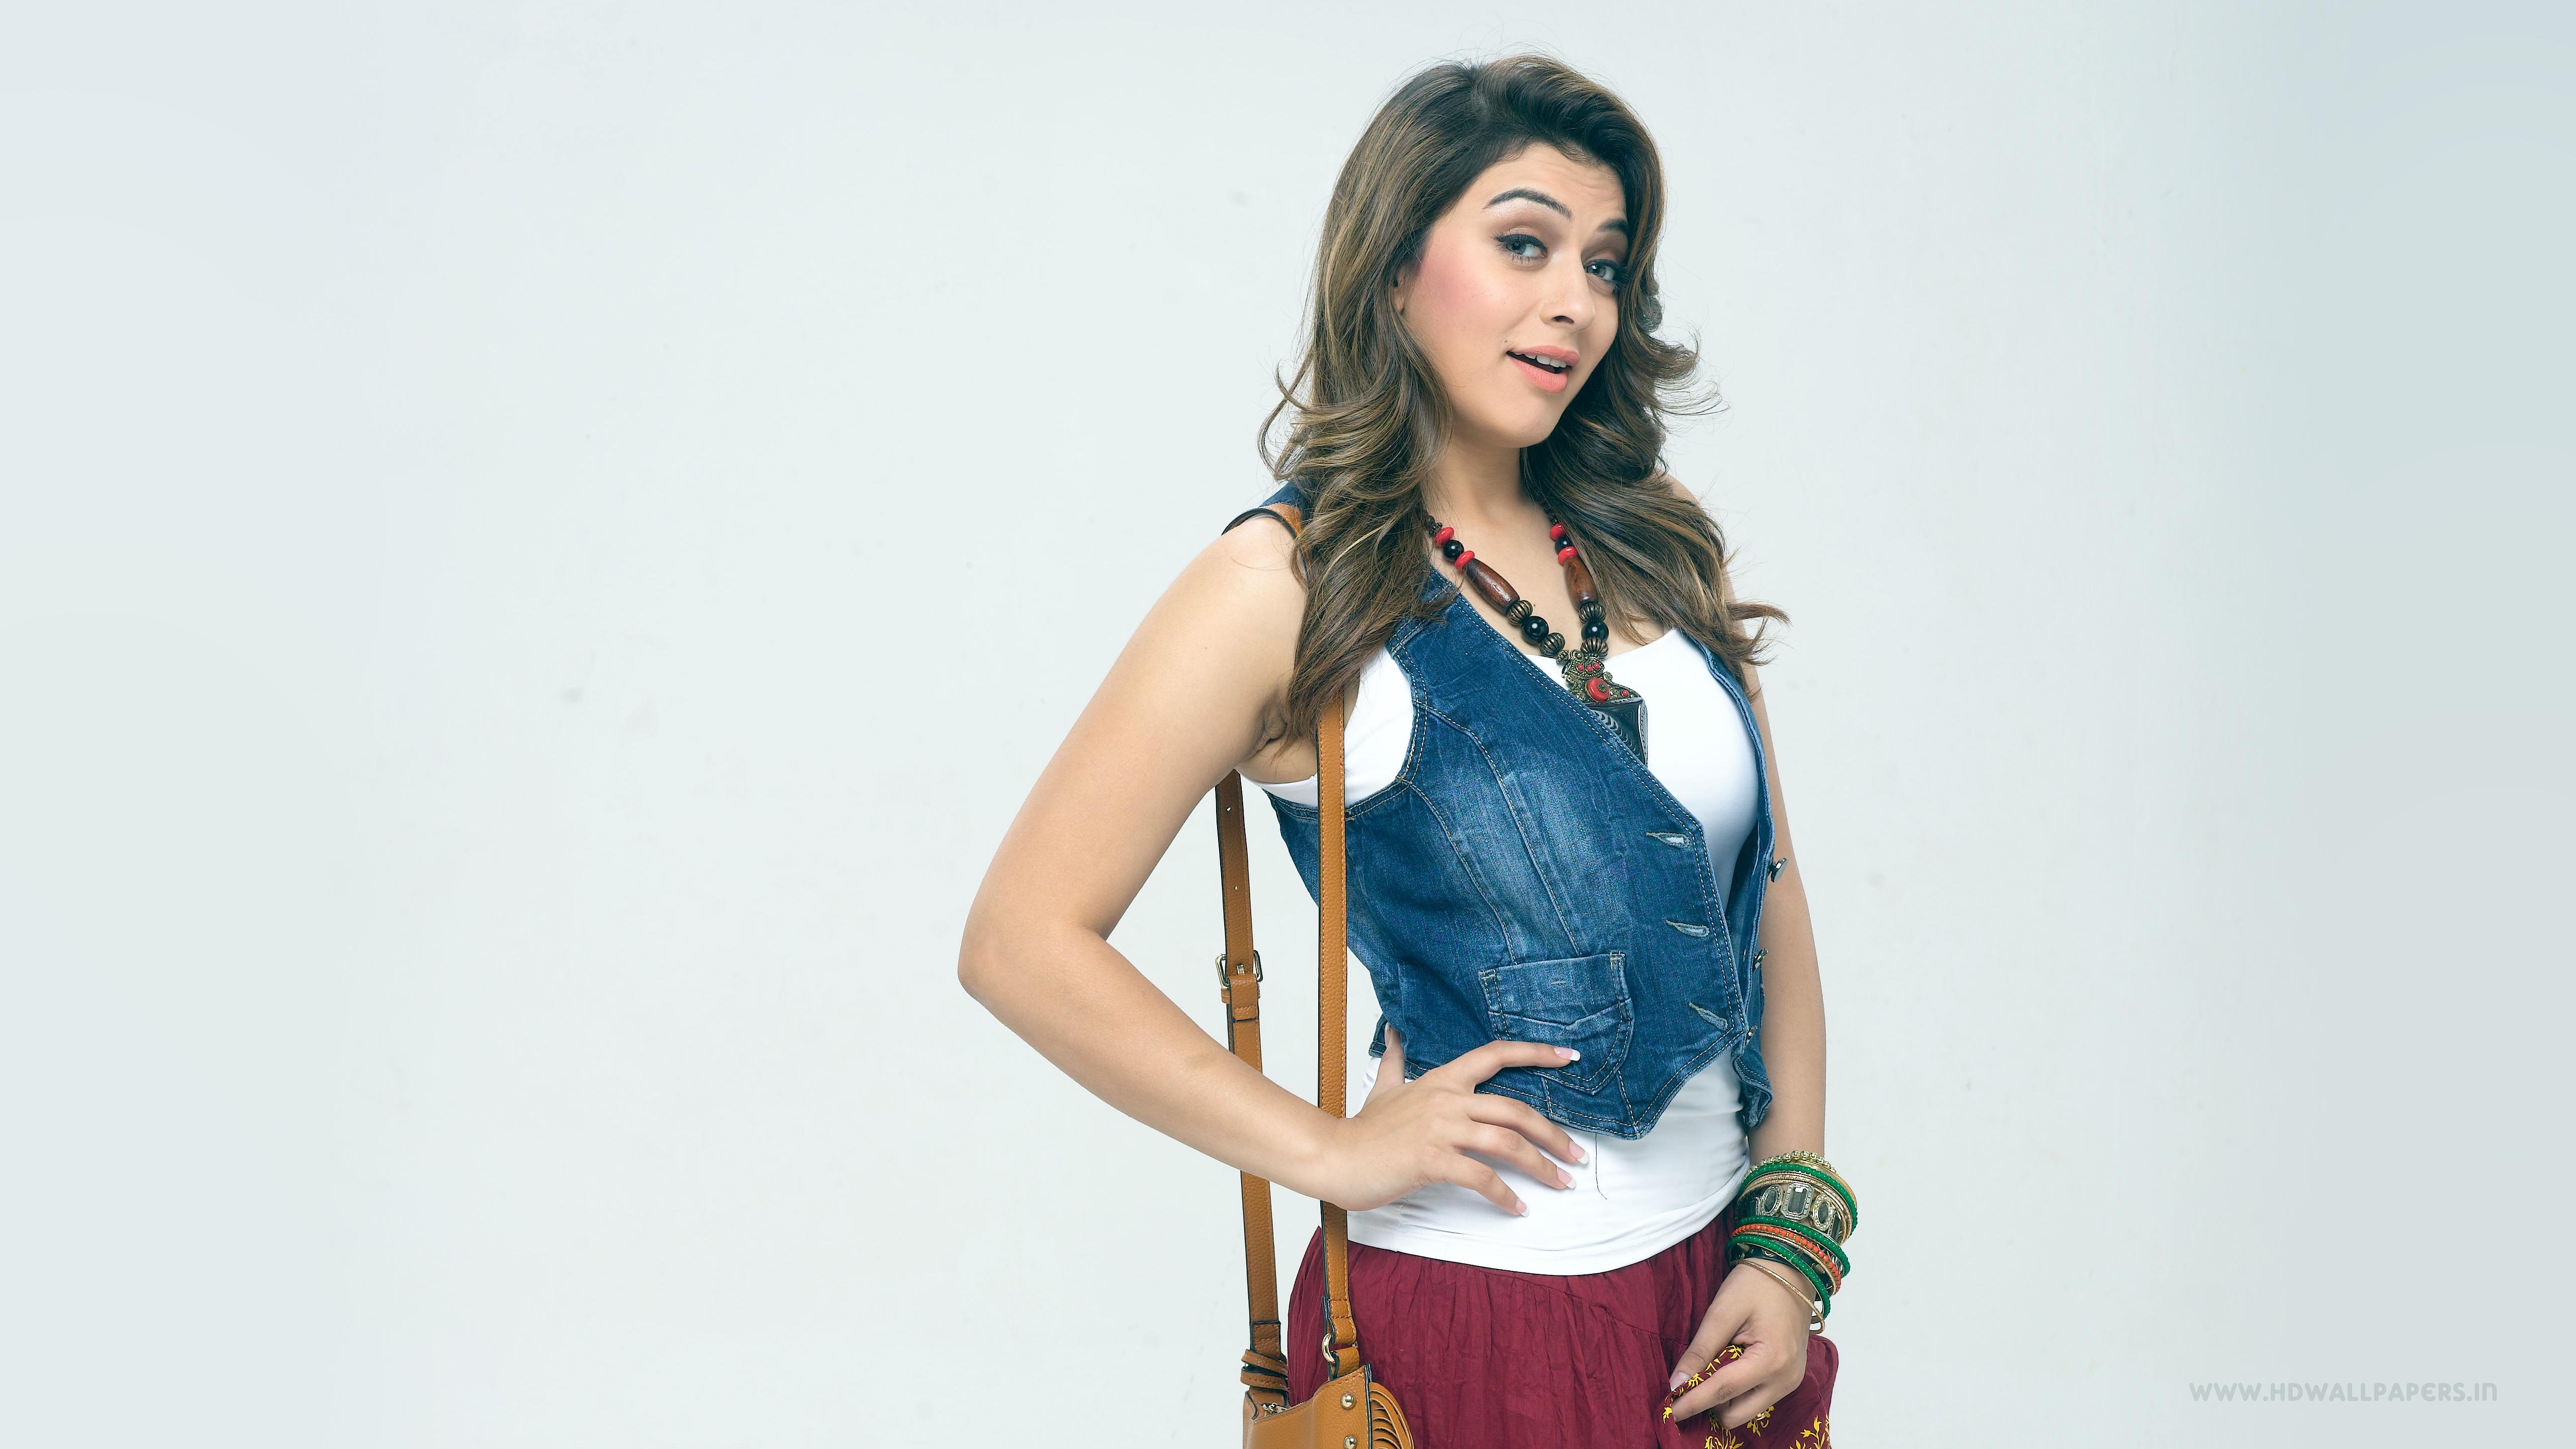 Tamil Actress Hansika Photos Free Download